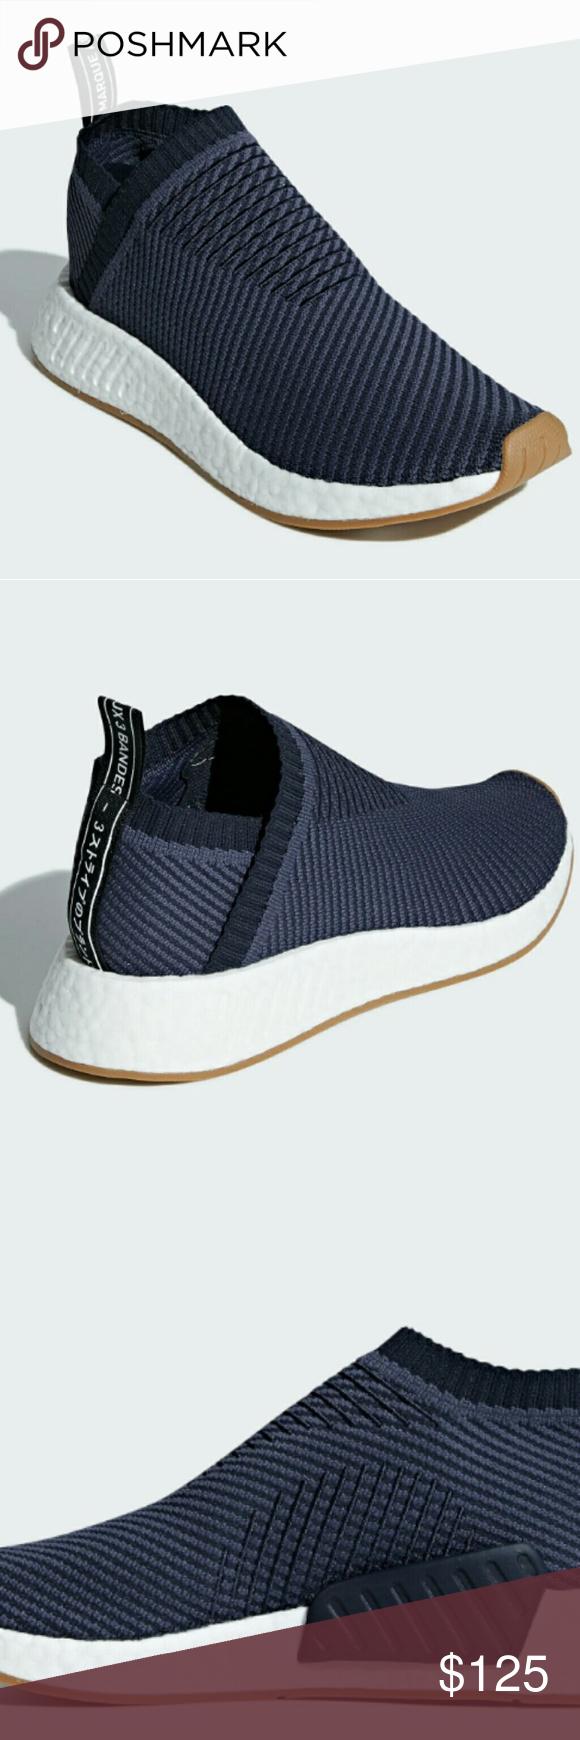 Adidas NMD CS2 Primeknit (Navy/Gum